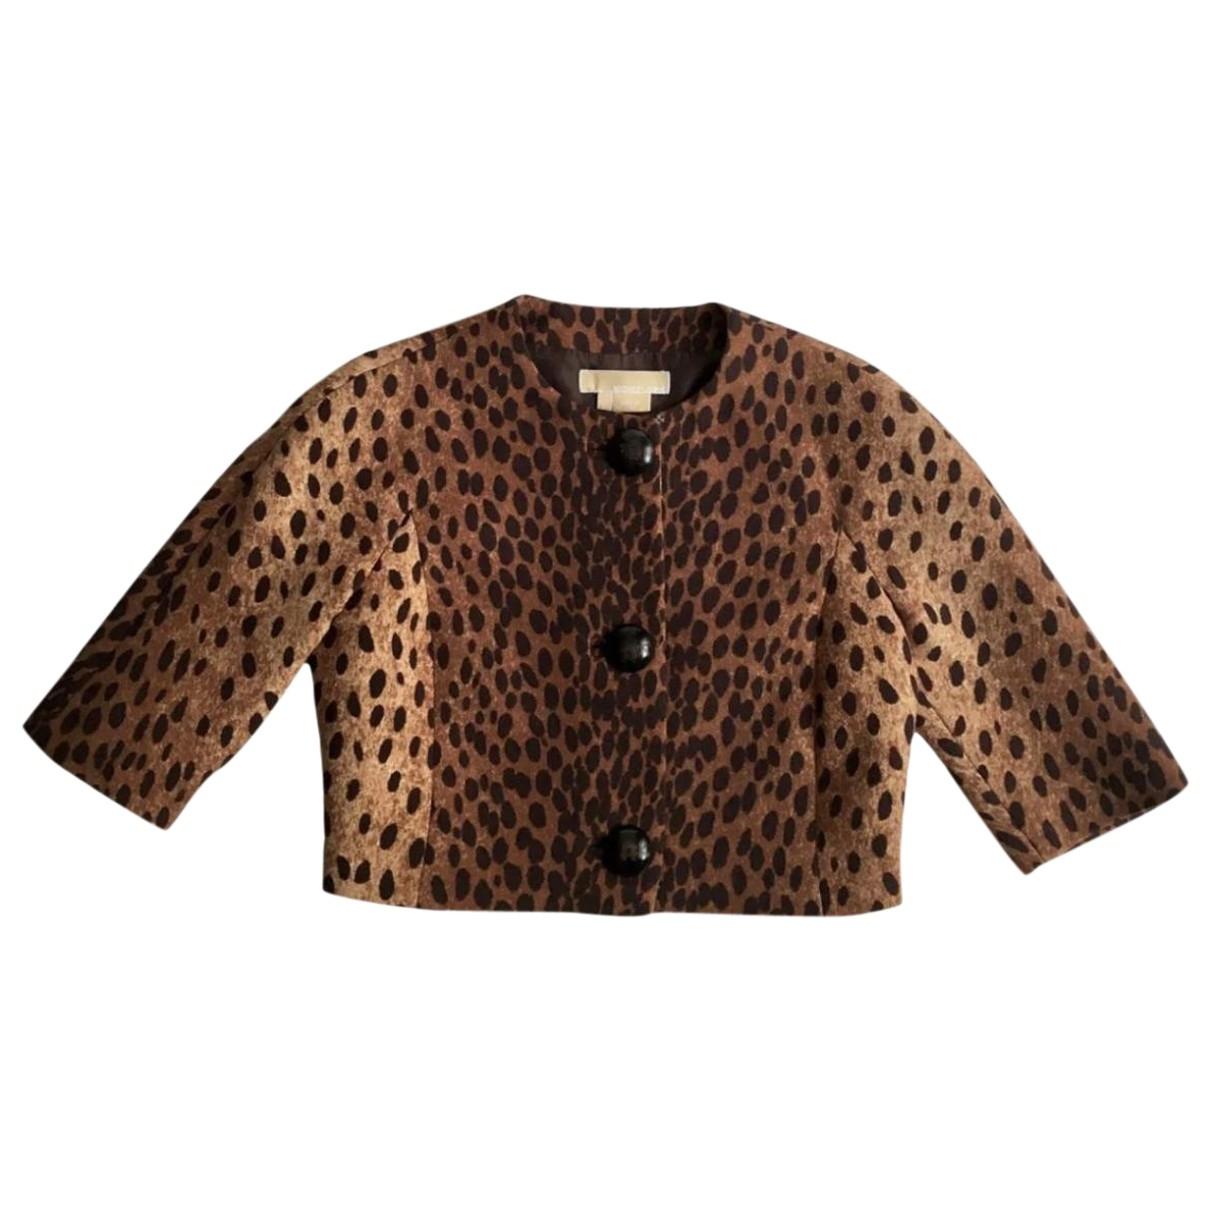 Michael Kors \N Brown Wool jacket for Women XS International